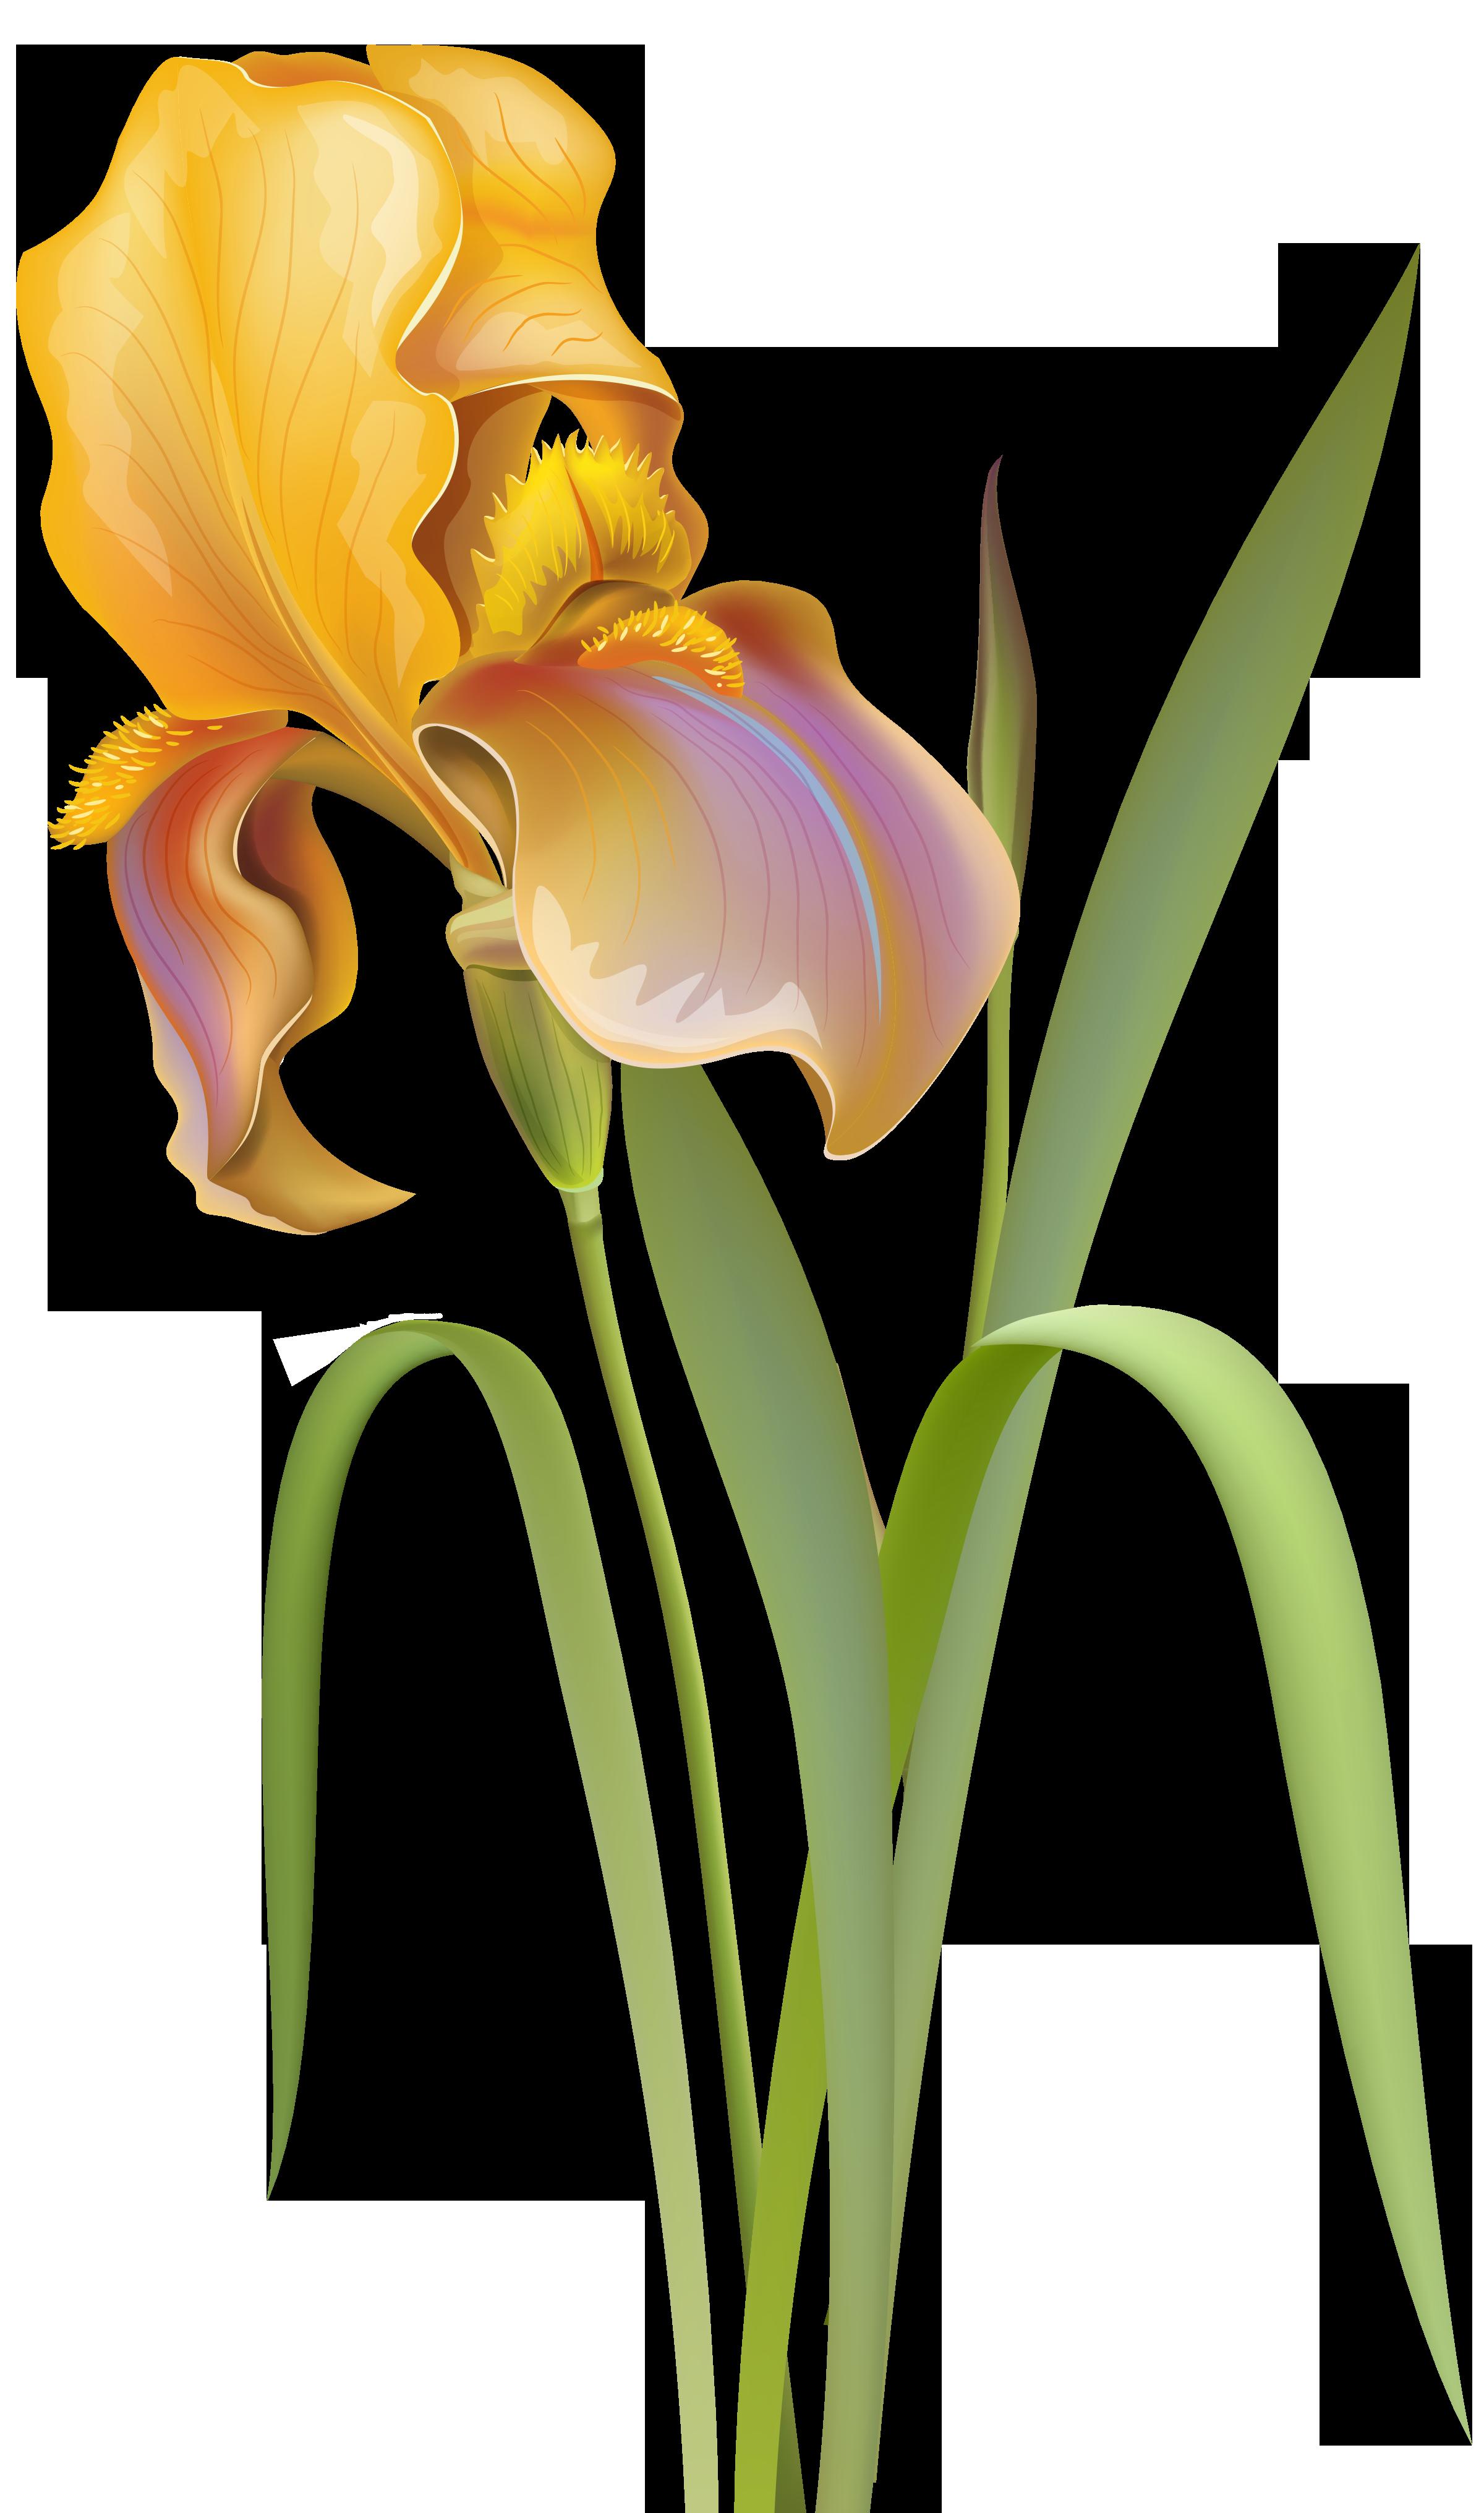 Flower clipart png transparent banner library download Iris Flower PNG Clip Art - Best WEB Clipart banner library download